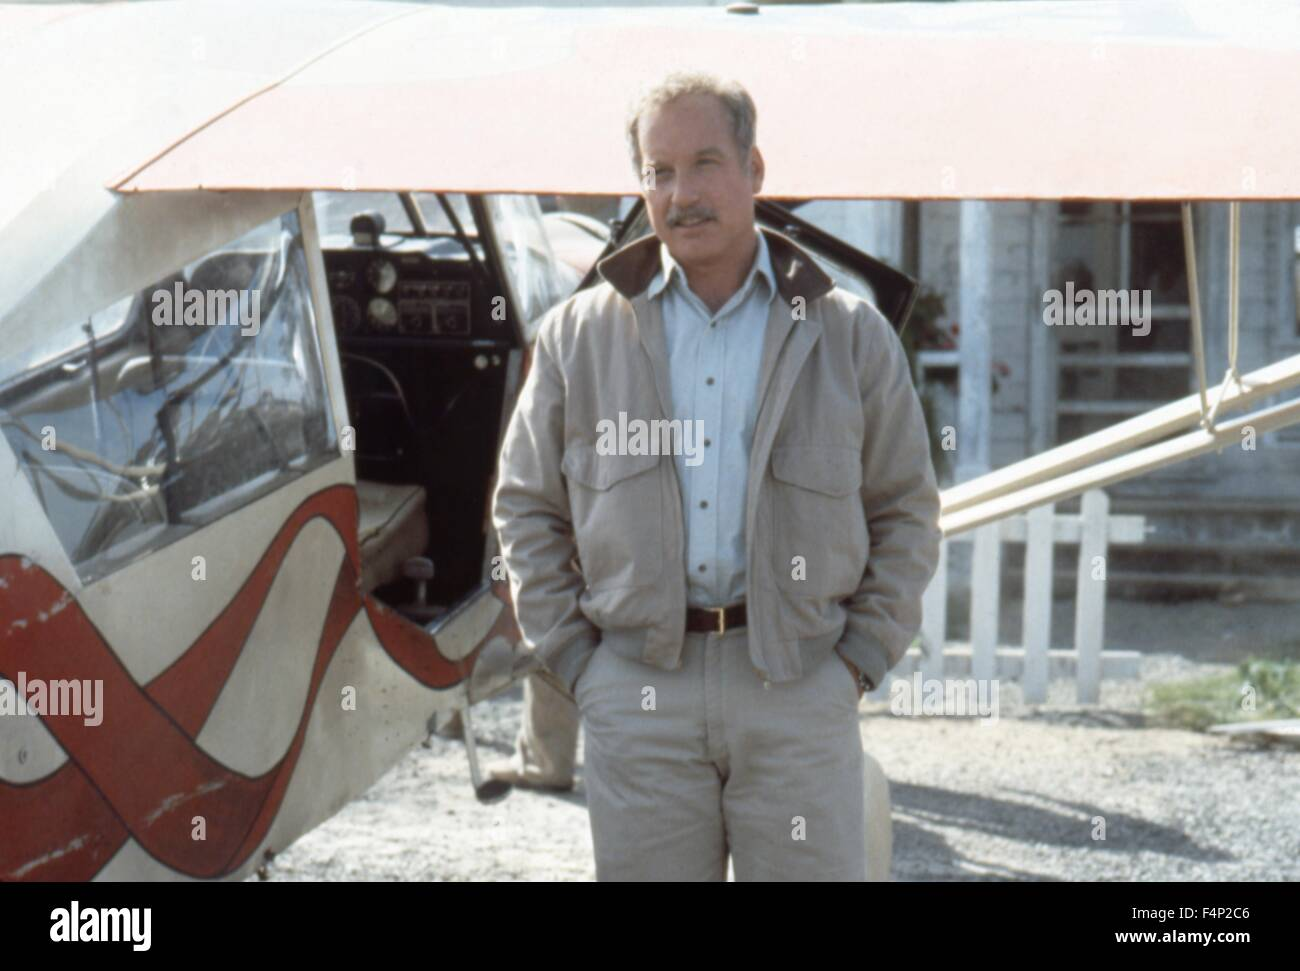 Richard Dreyfuss / Always 1989 directed by Steven Spielberg - Stock Image